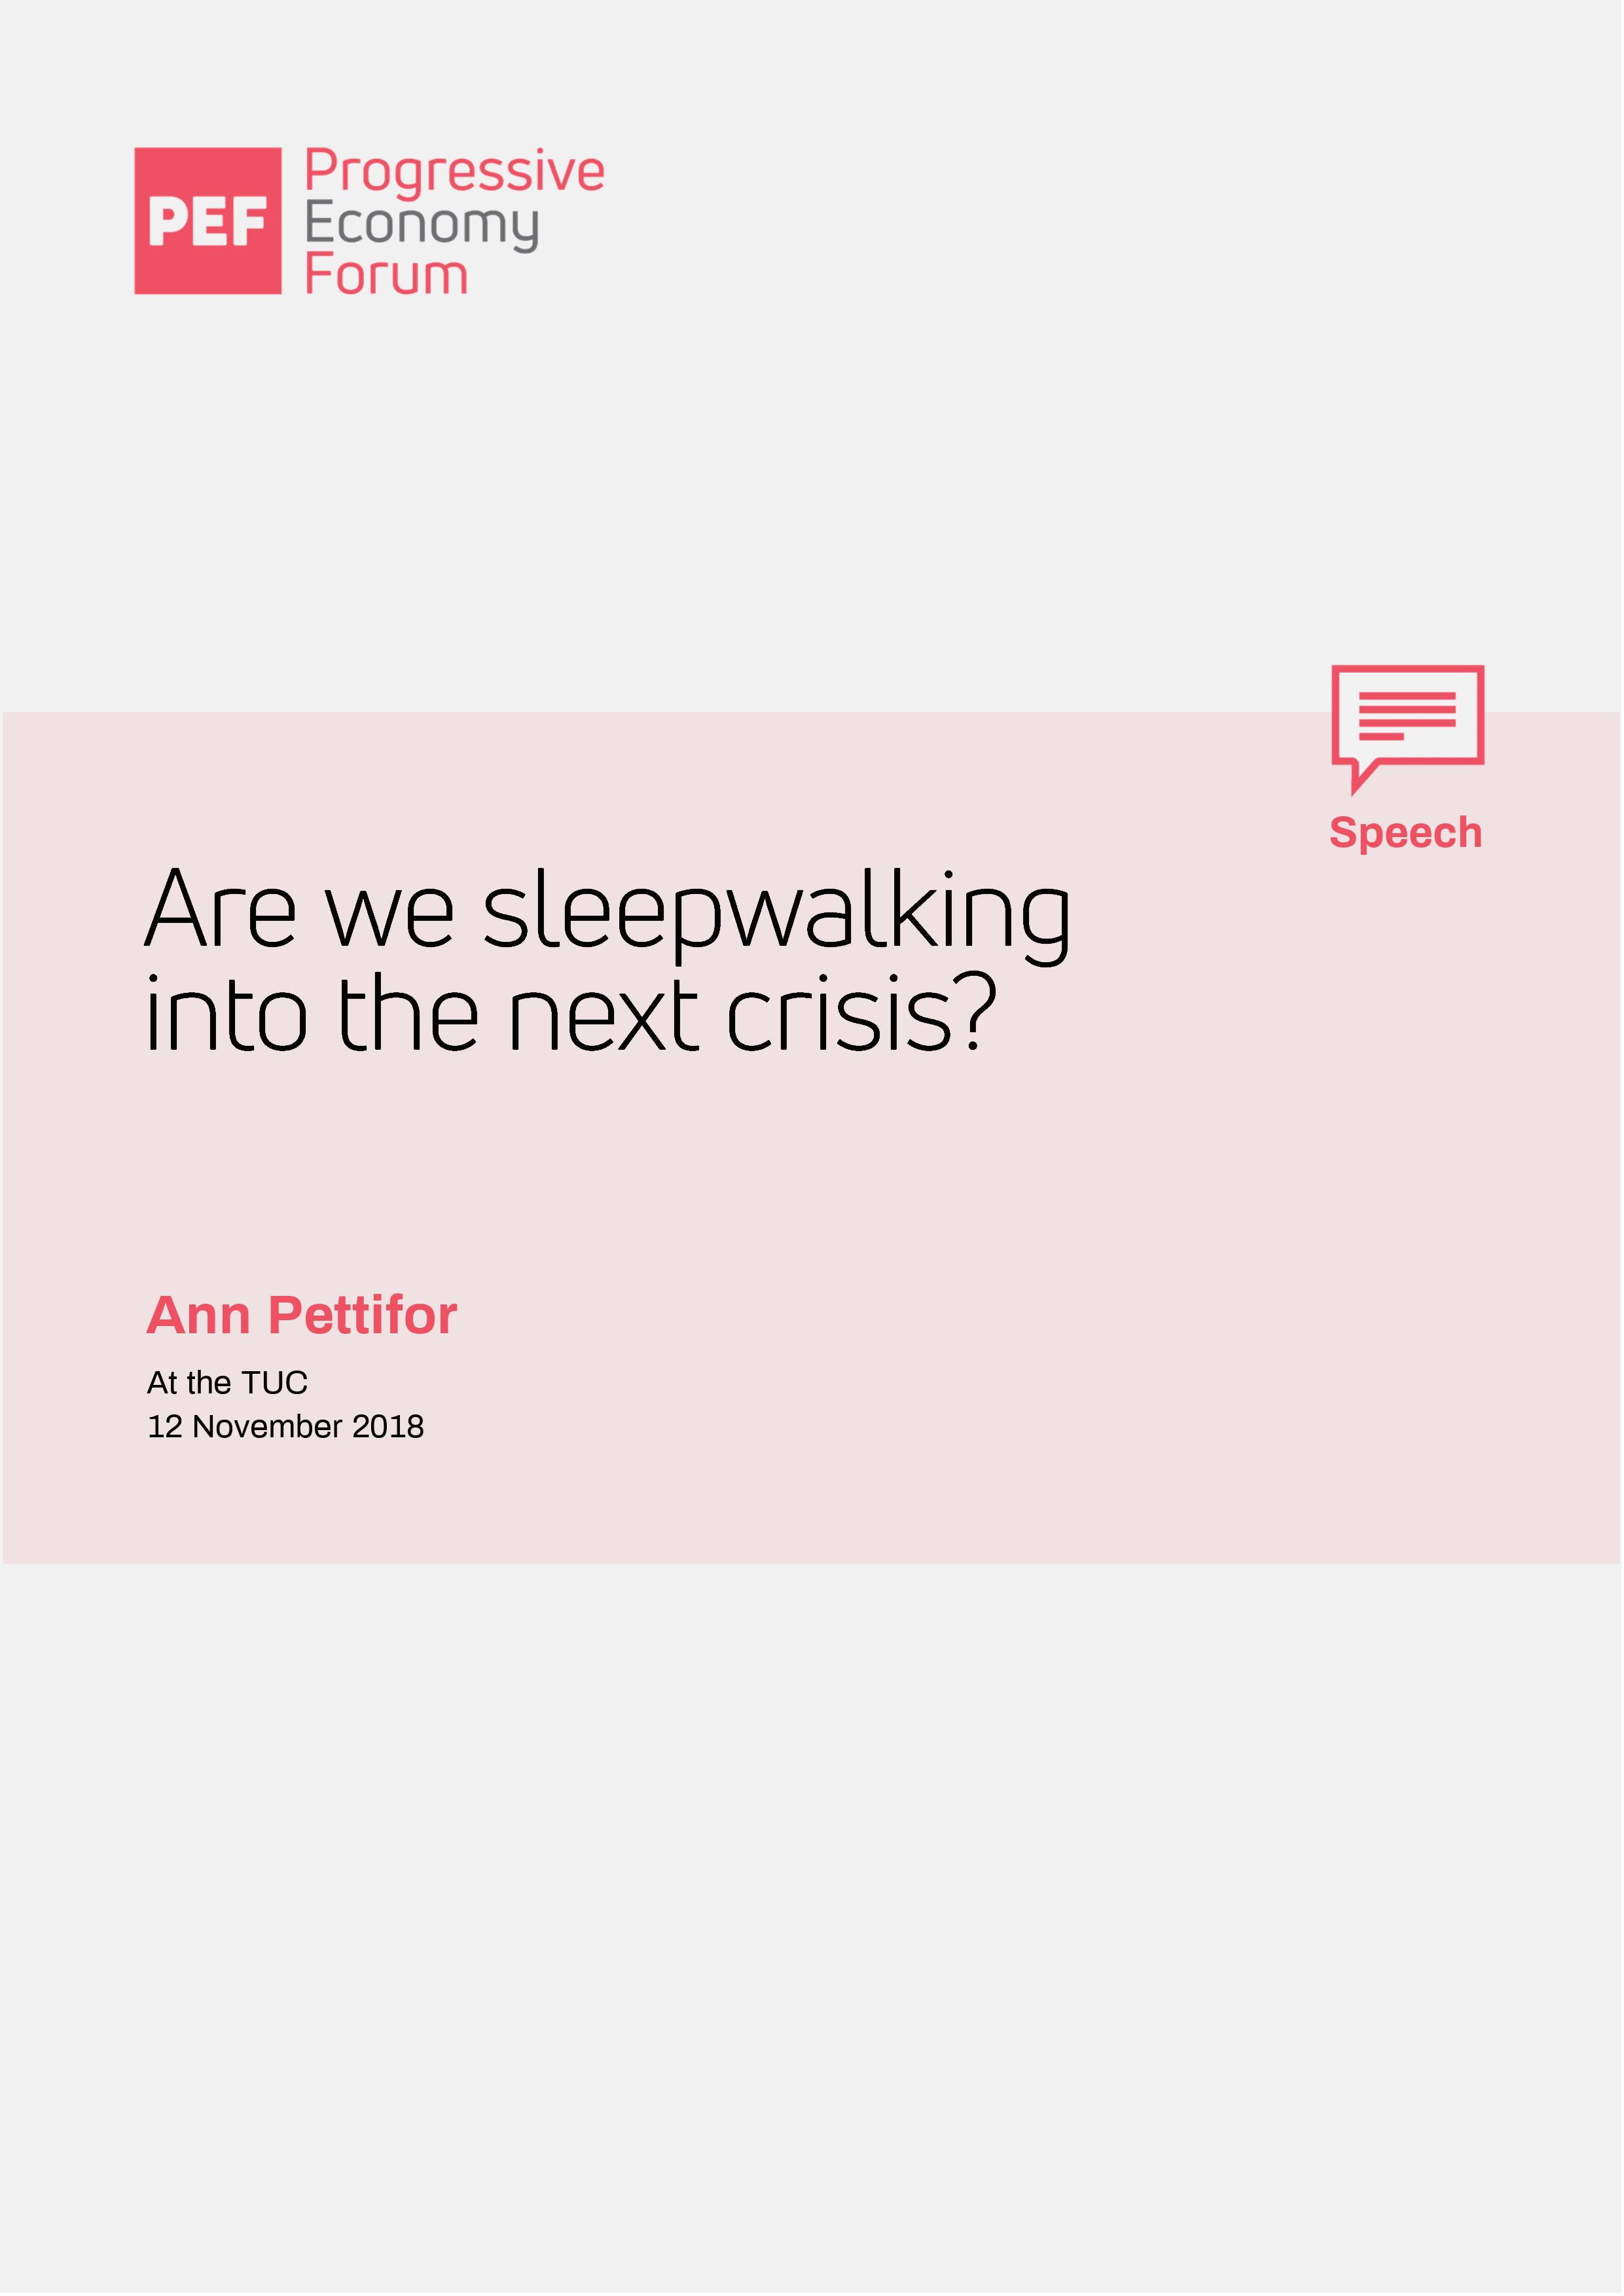 Are We In Danger Of Sleepwalking Into >> Are We Sleepwalking Into The Next Crisis The Progressive Economy